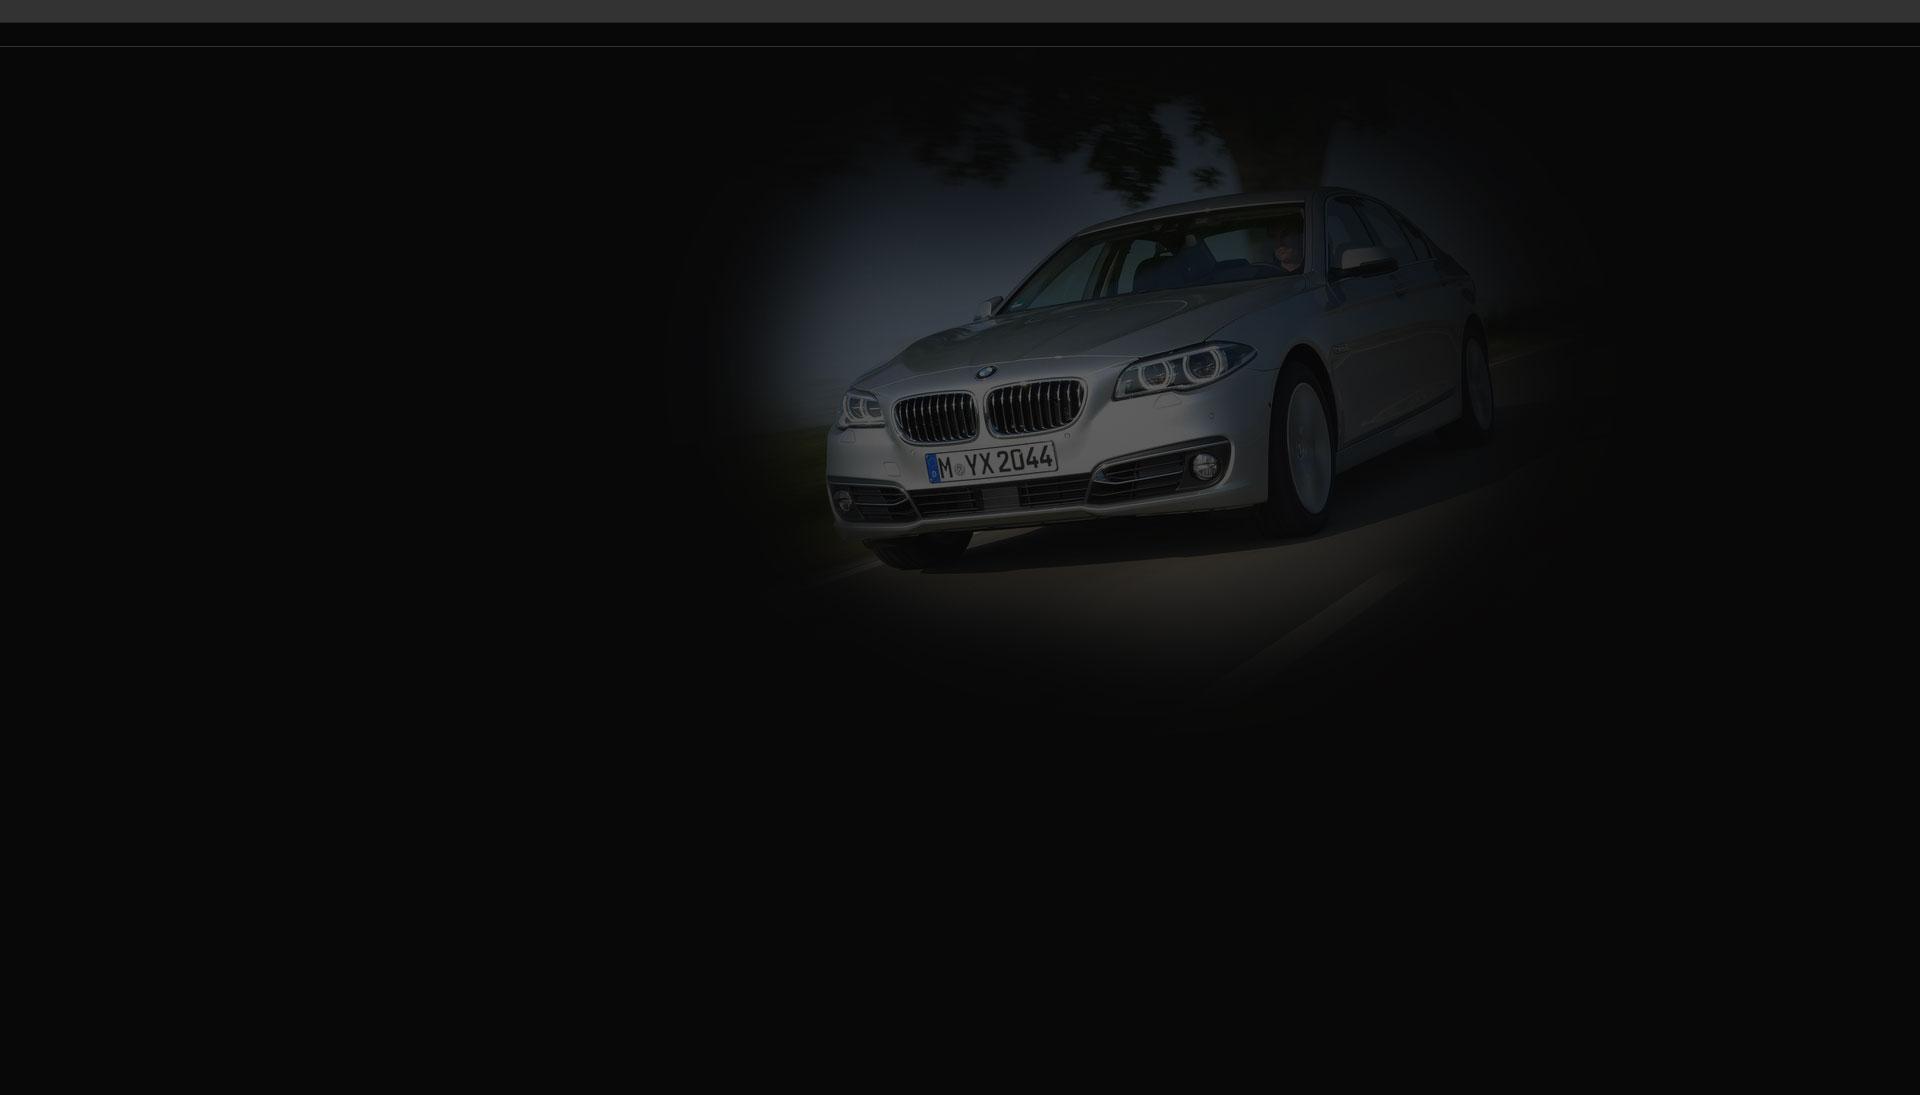 Lexus Luxury Cars financing For Sale Schenectady Run & Tell Auto Sales